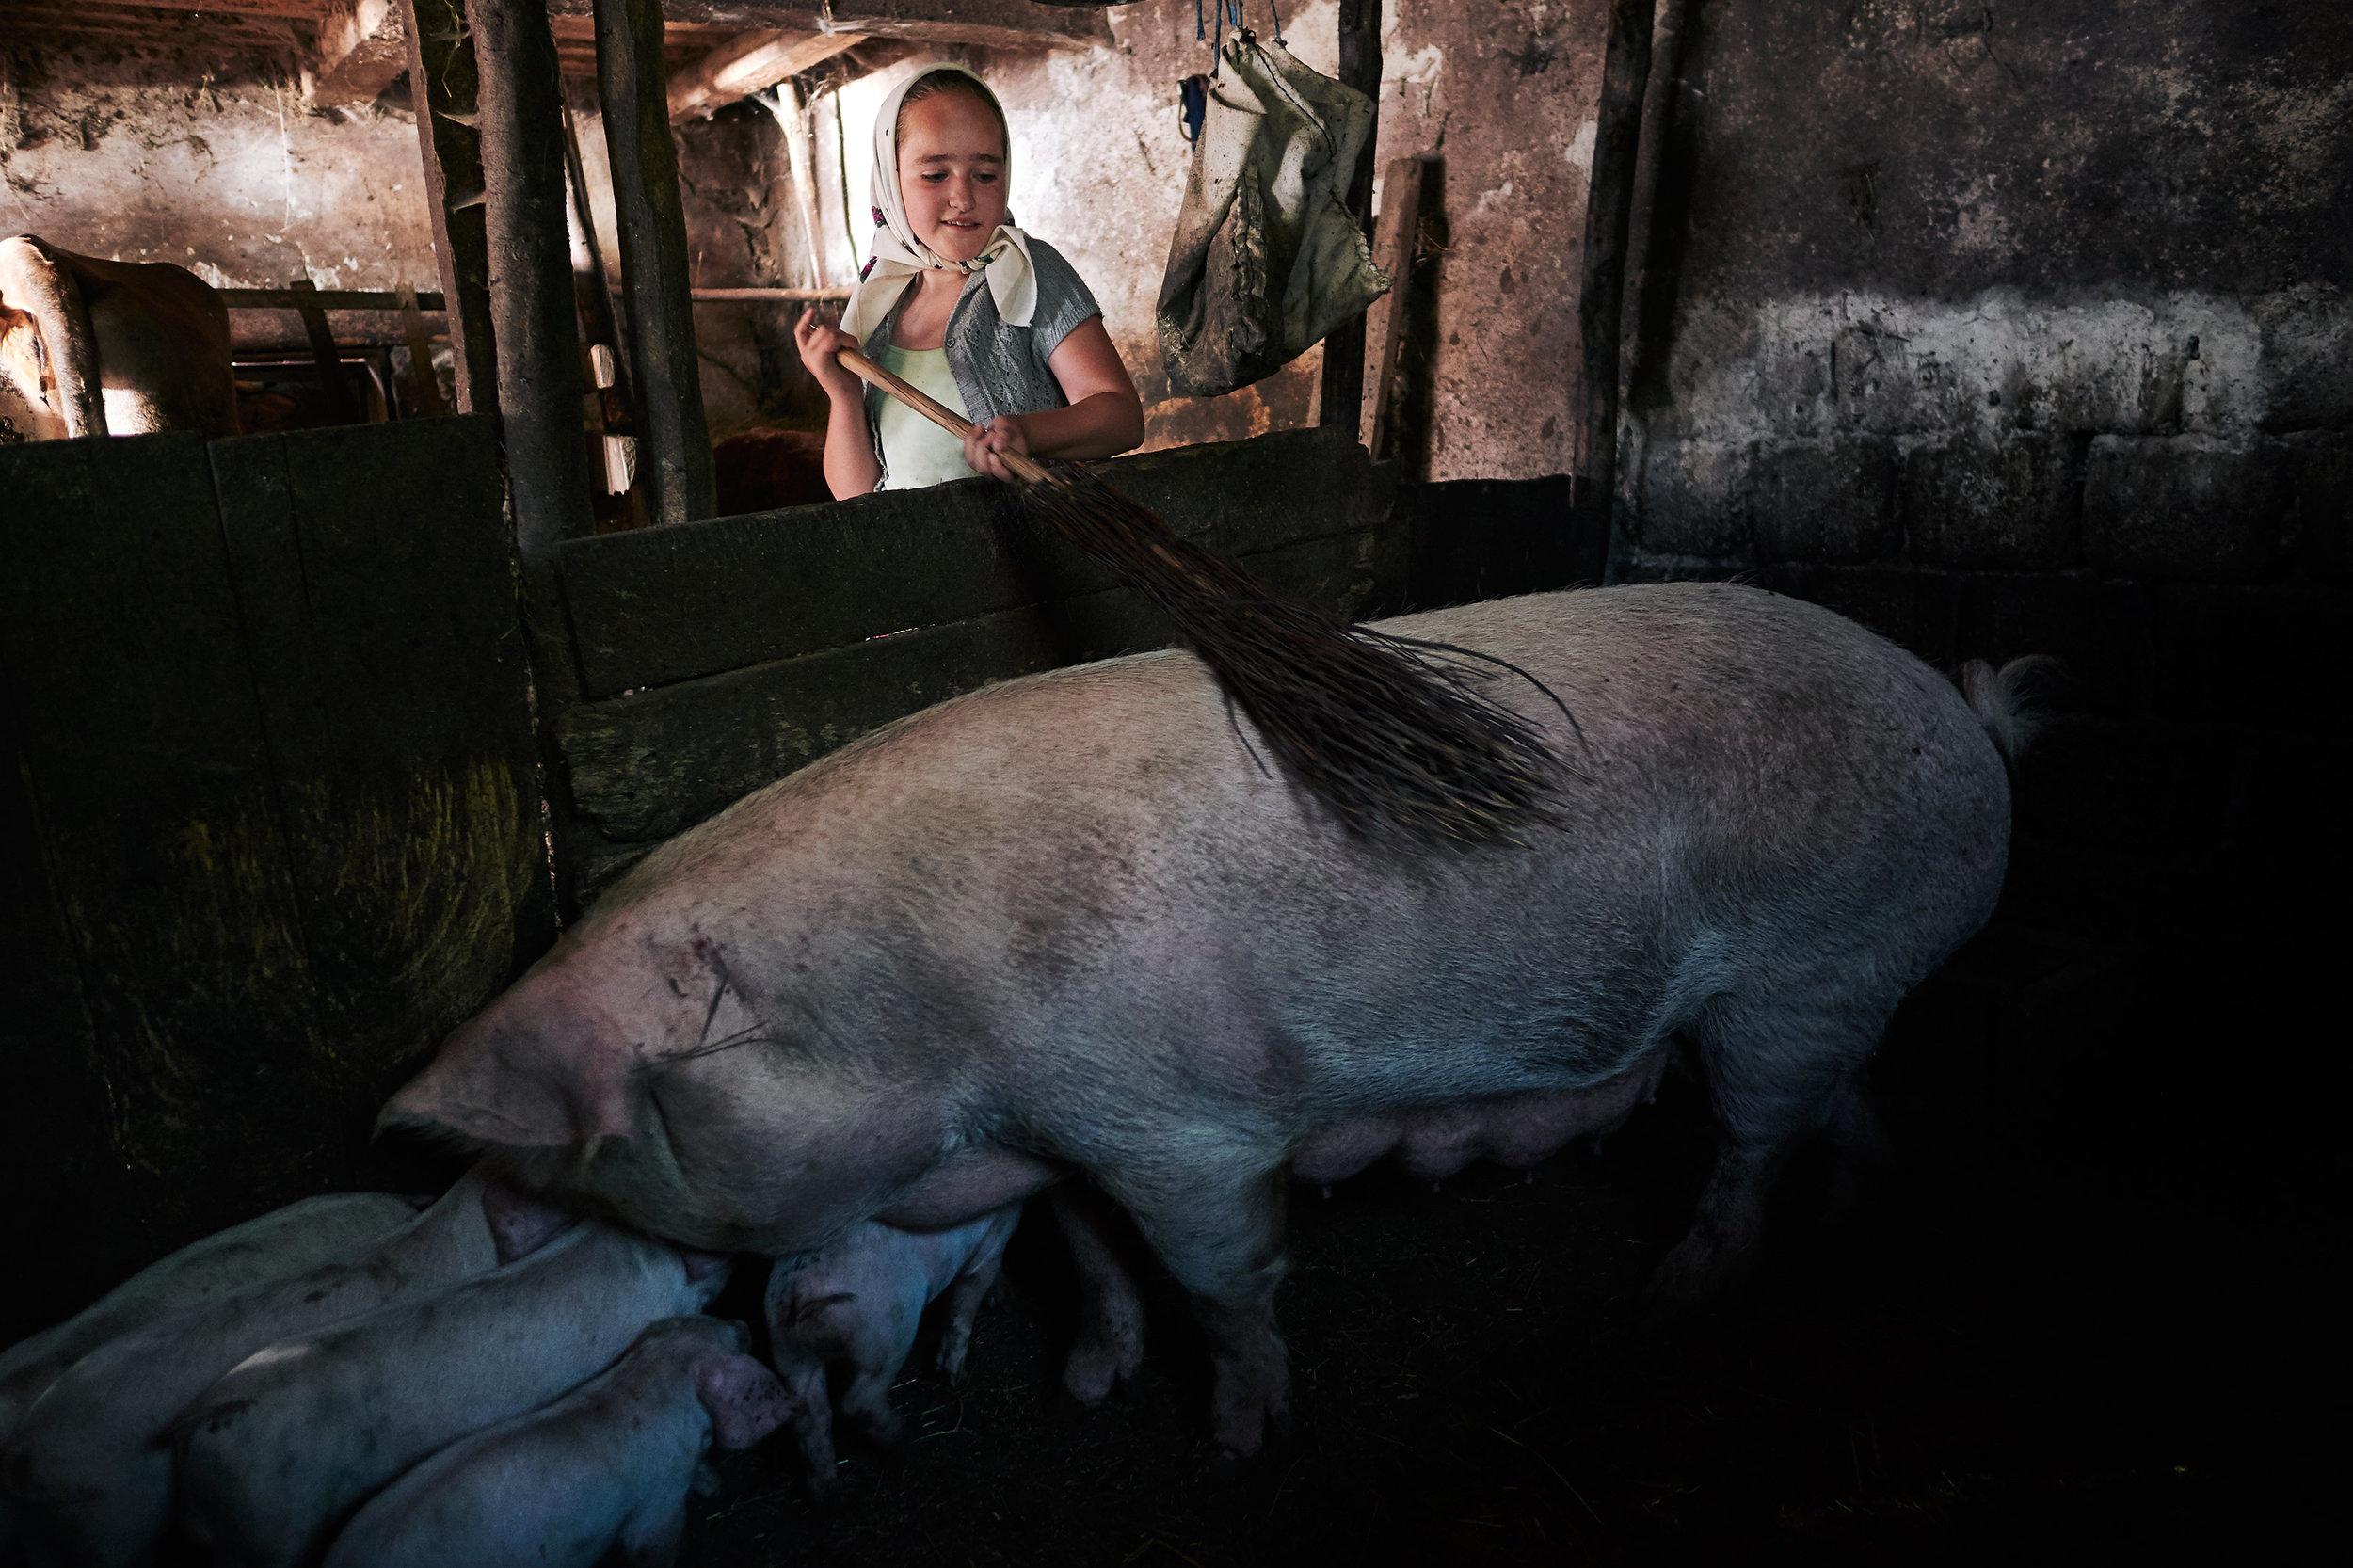 Rural-girl-feeds-pig-Maramures-Romania